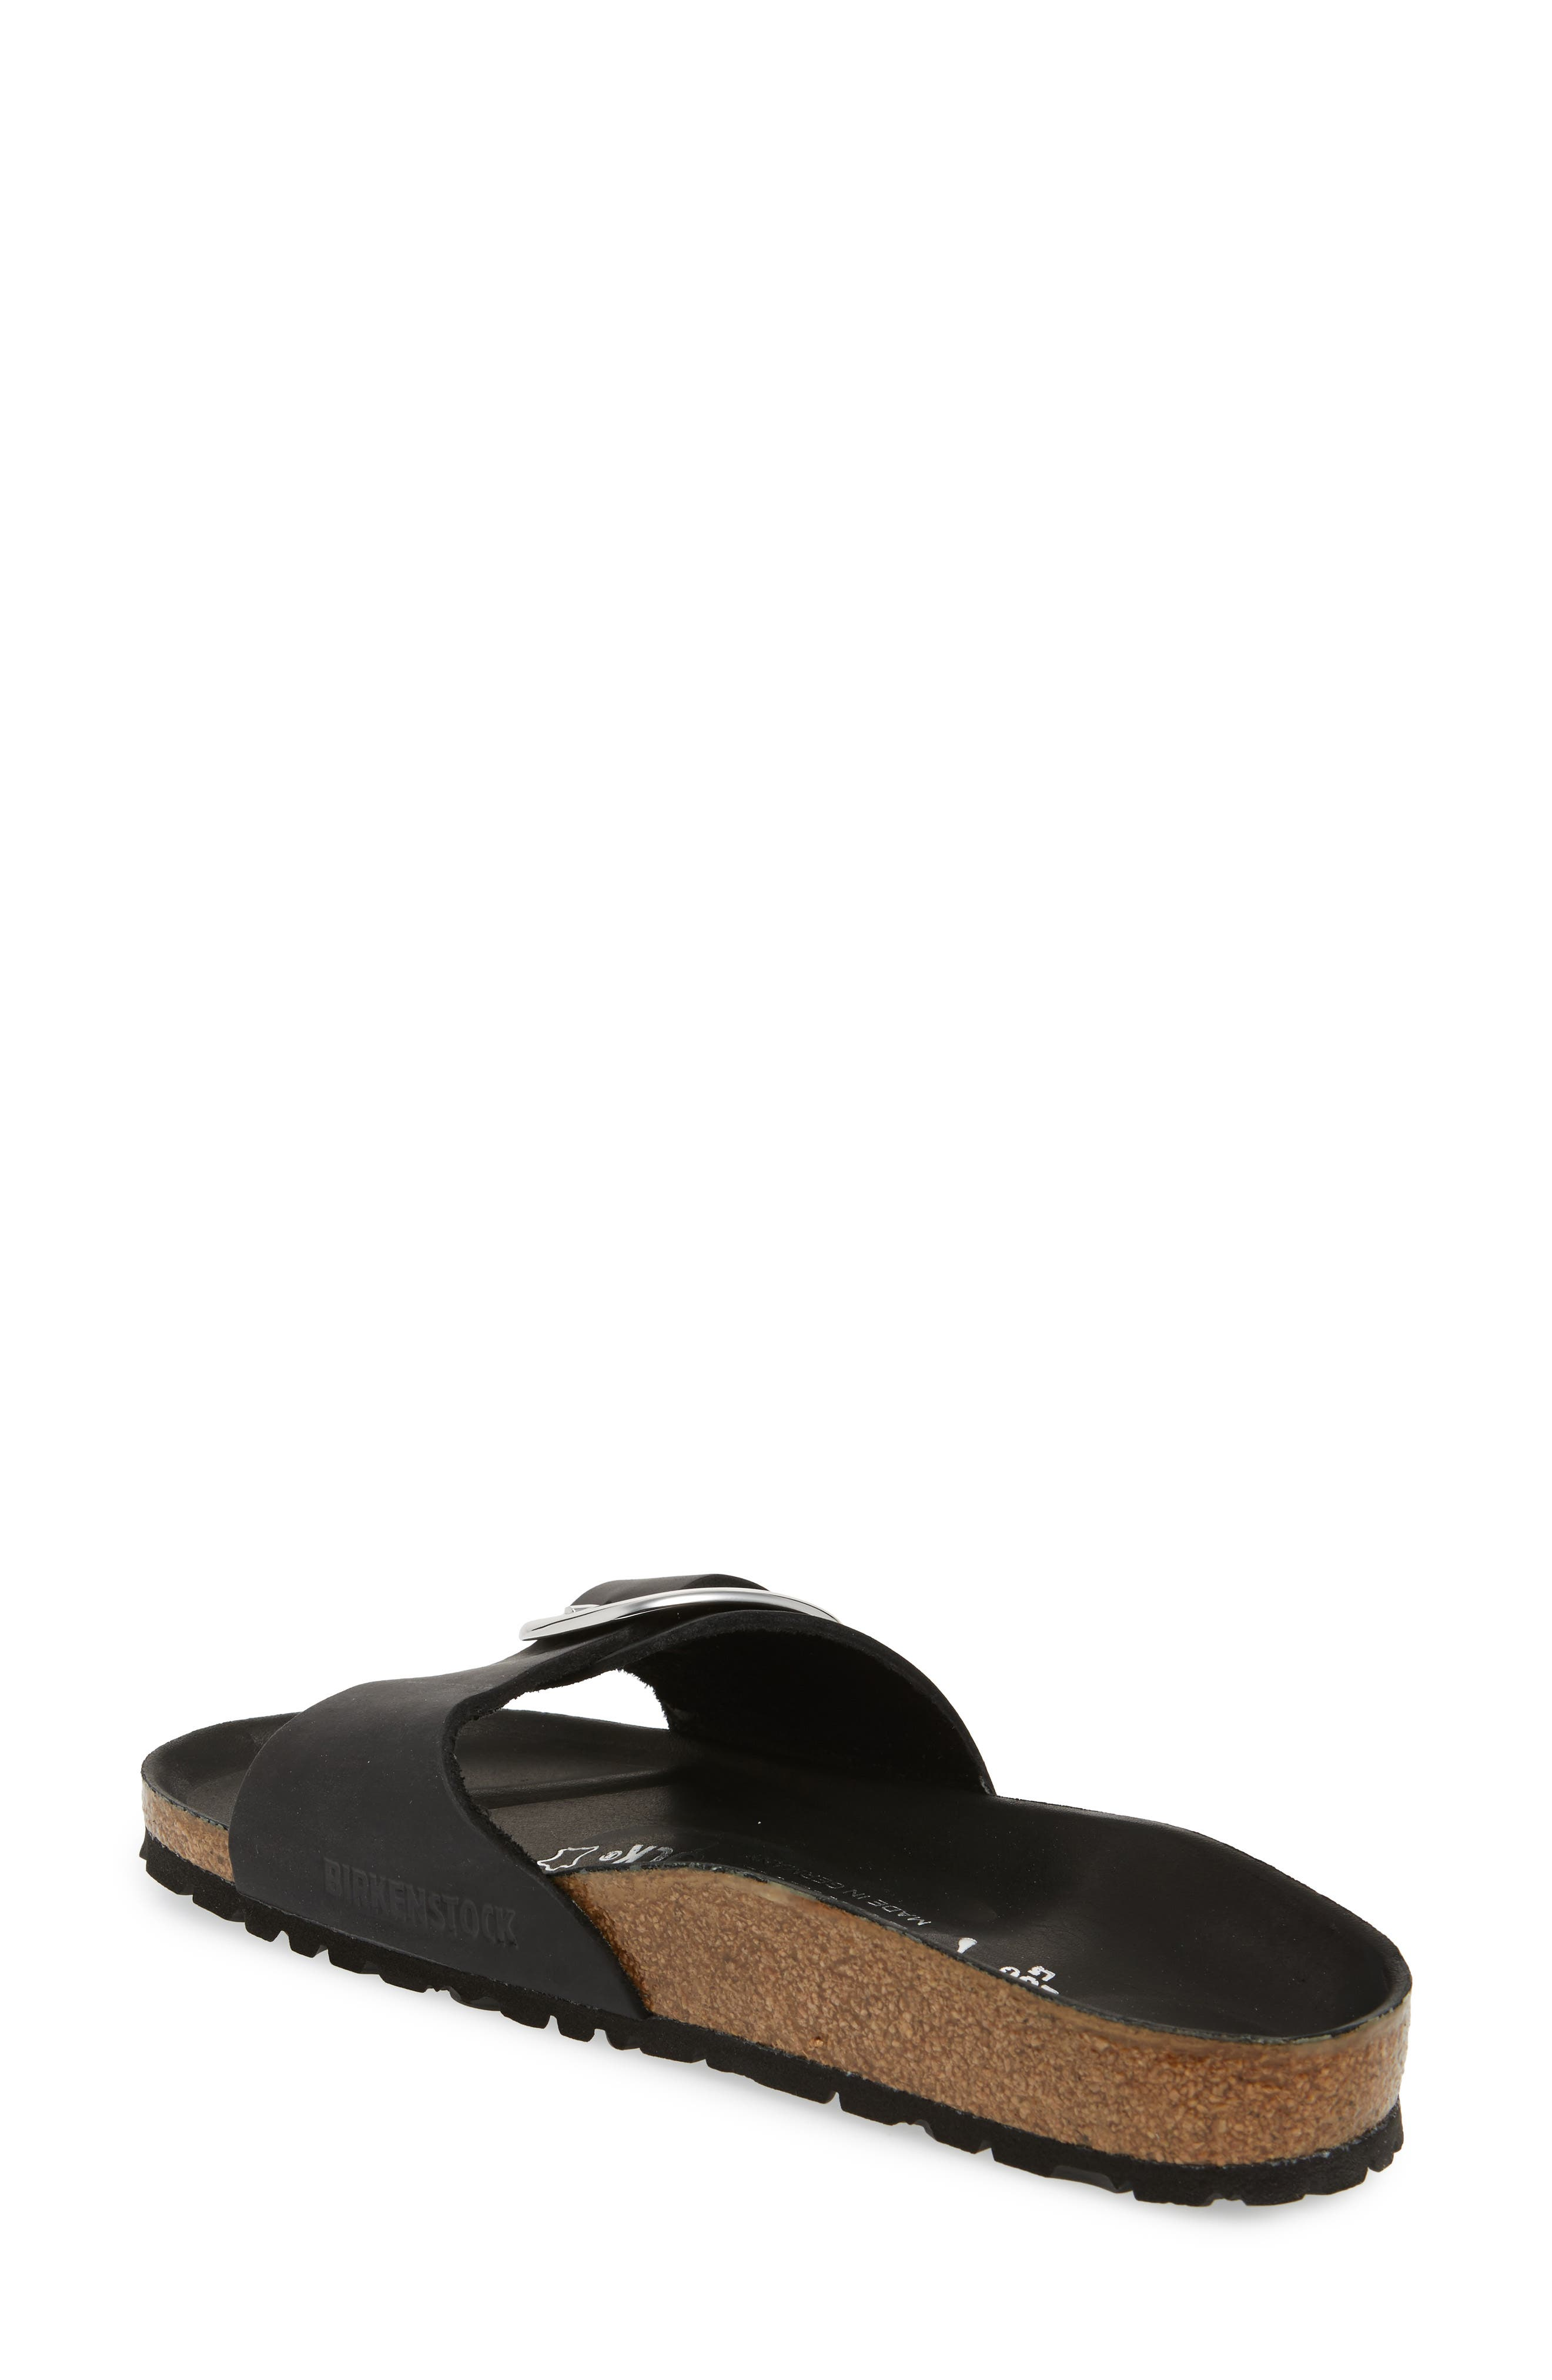 Madrid Big Buckle Slide Sandal,                             Alternate thumbnail 2, color,                             Black Leather